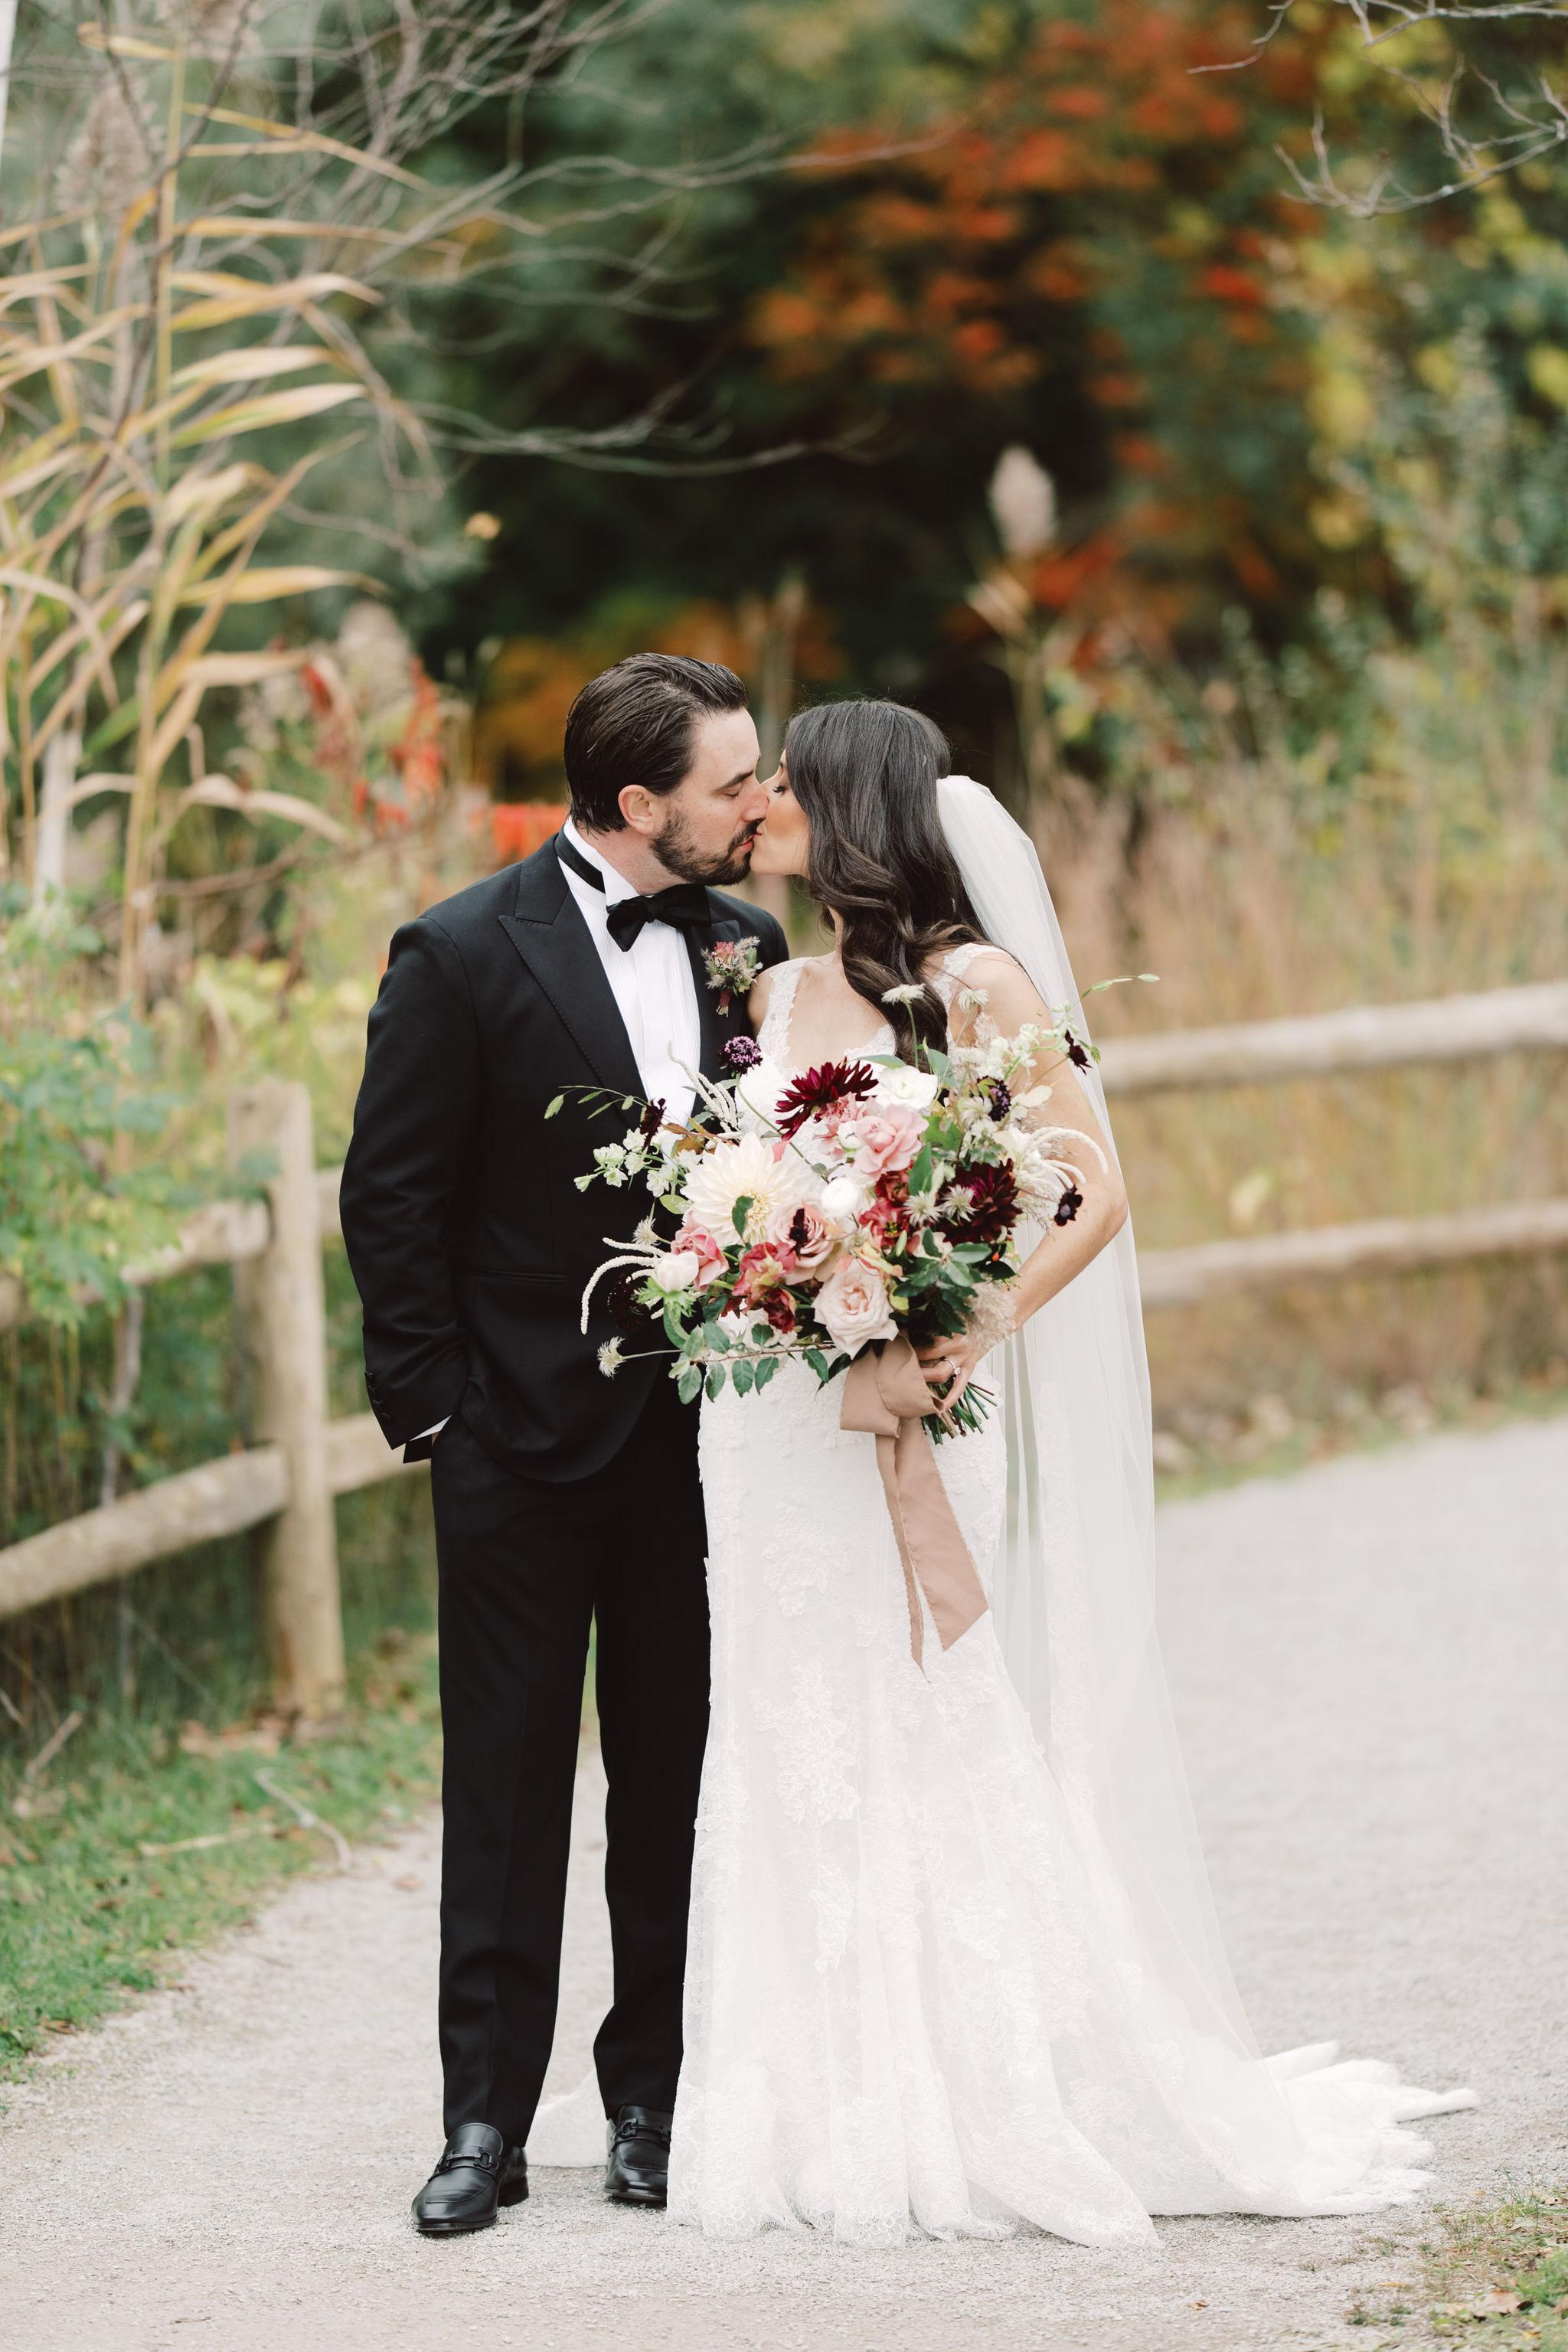 0479-artiese-evergreen-brickworks-wedding-ashleycraig-26657.jpg